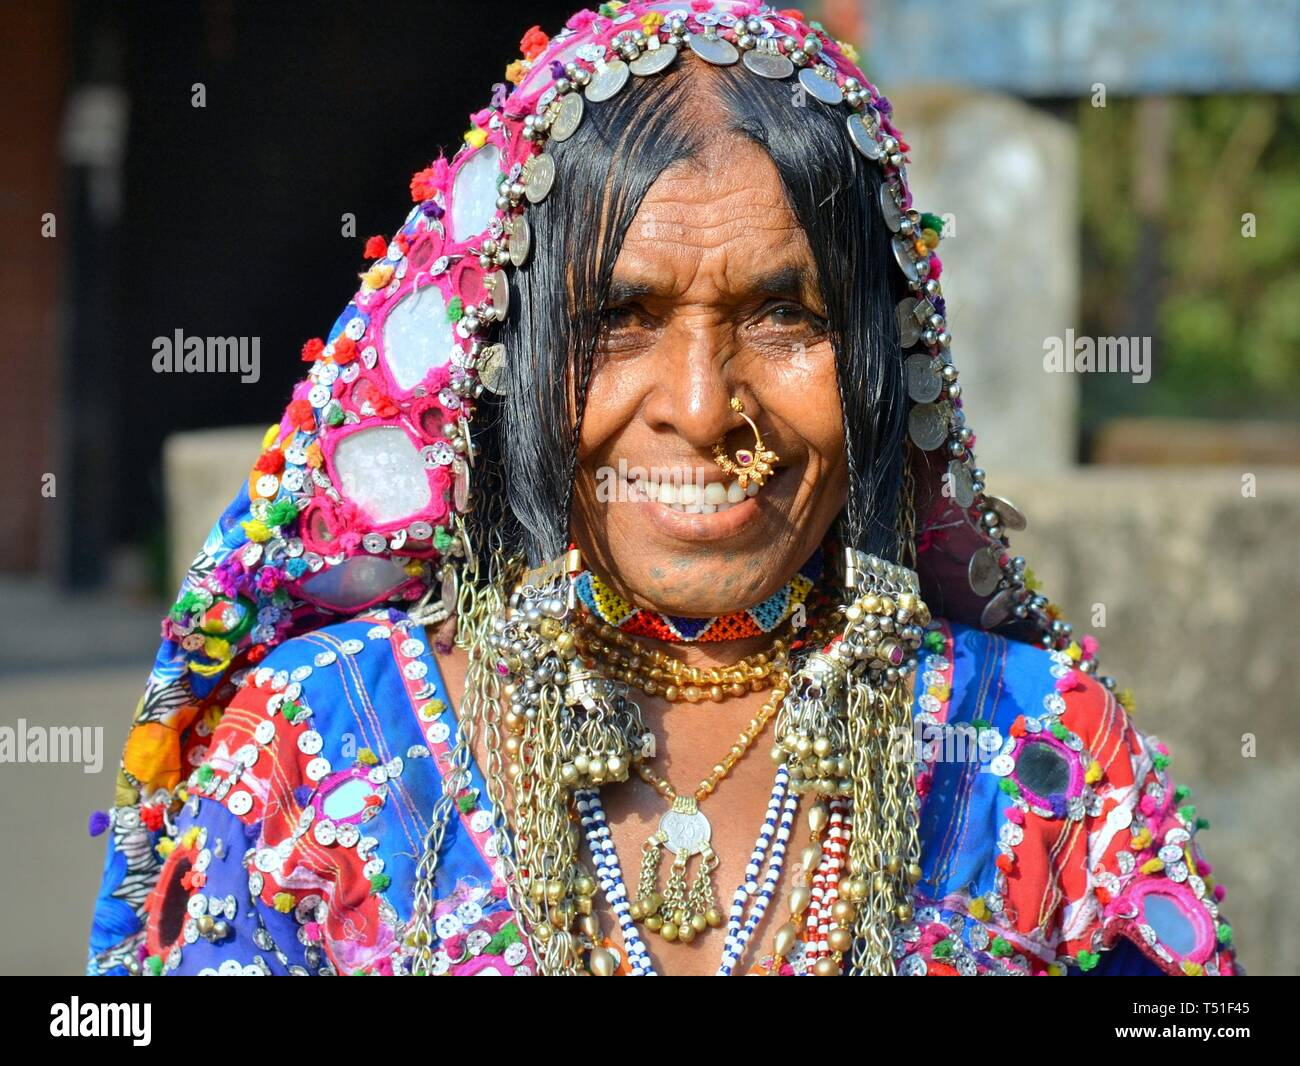 Elderly Indian Lambani tribal woman from Karnataka (Banjara woman, Indian  gypsy) with traditional chin tattoos and nose jewelry smiles for the camera  Stock Photo - Alamy